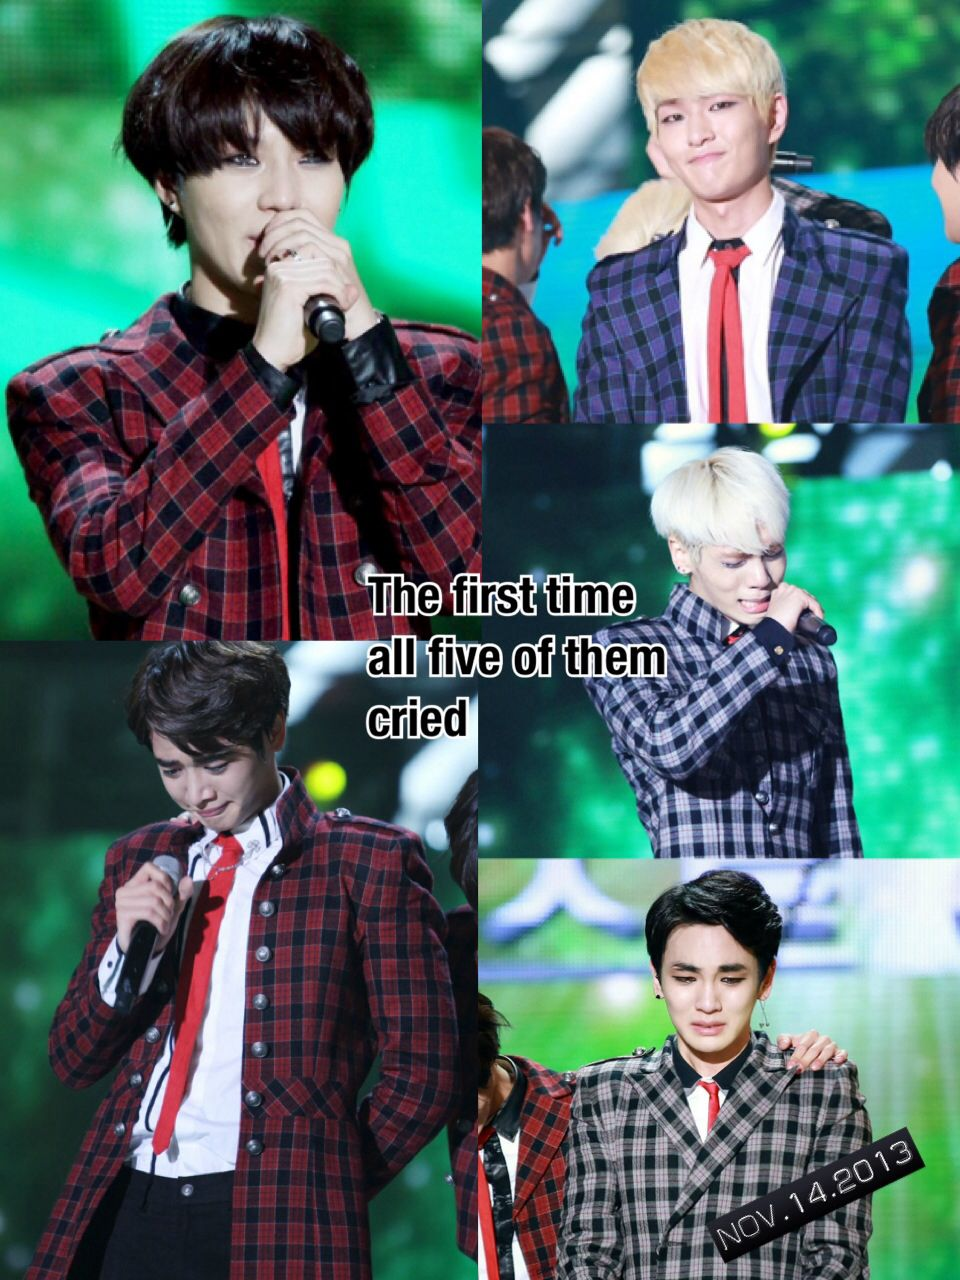 Melon Music Awards Artist of the Year SHINee